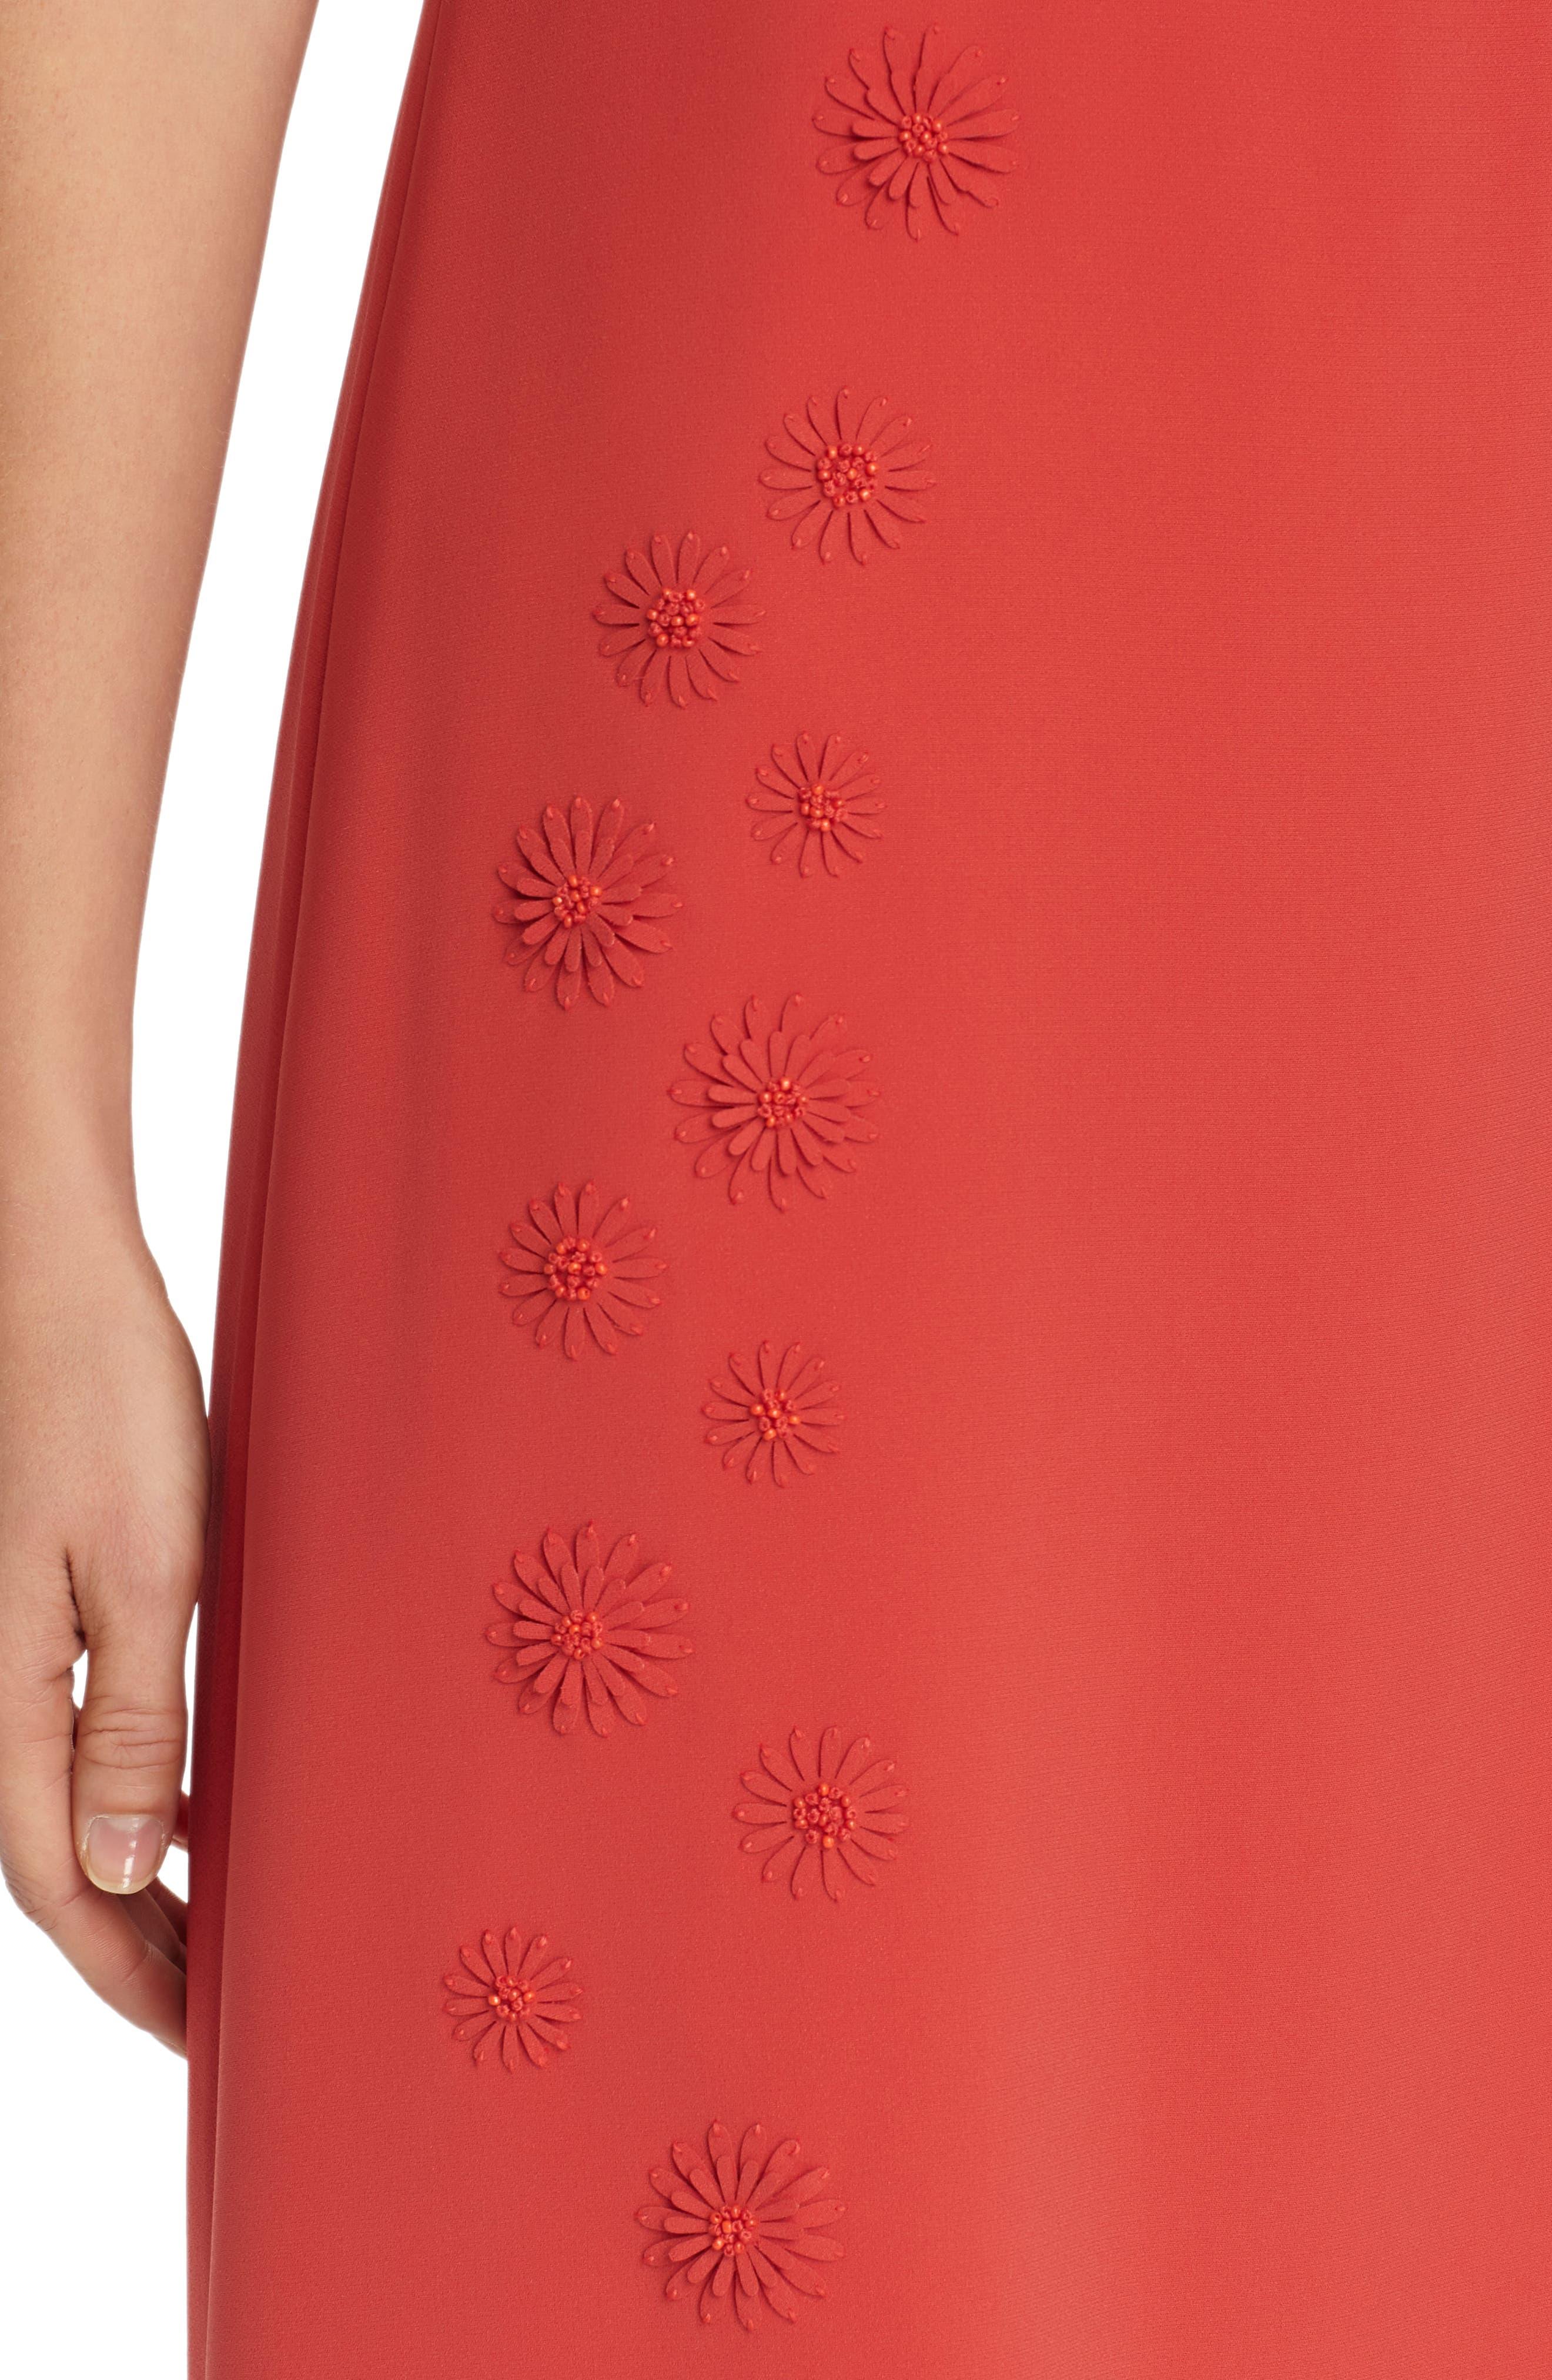 Cheyenne Floral Embellished A-Line Dress,                             Alternate thumbnail 3, color,                             604